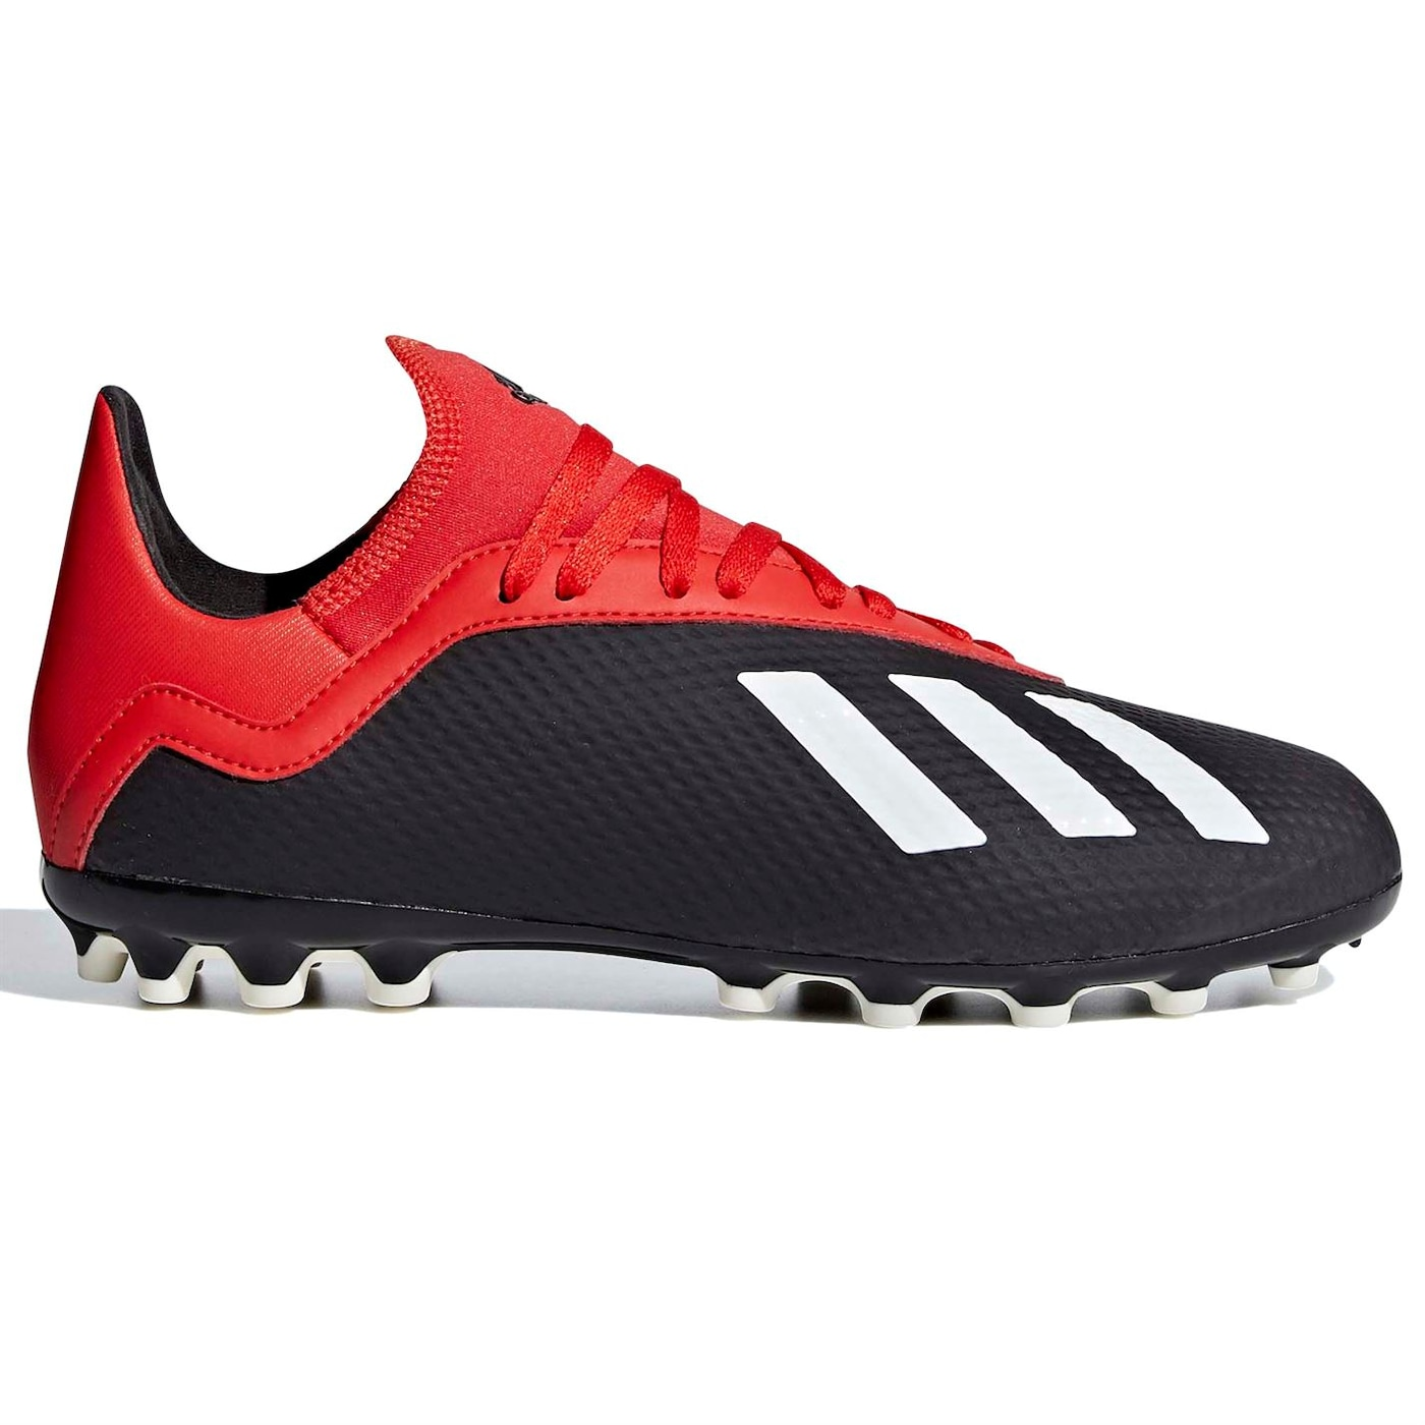 kopačky adidas X 18.3 dětské AG